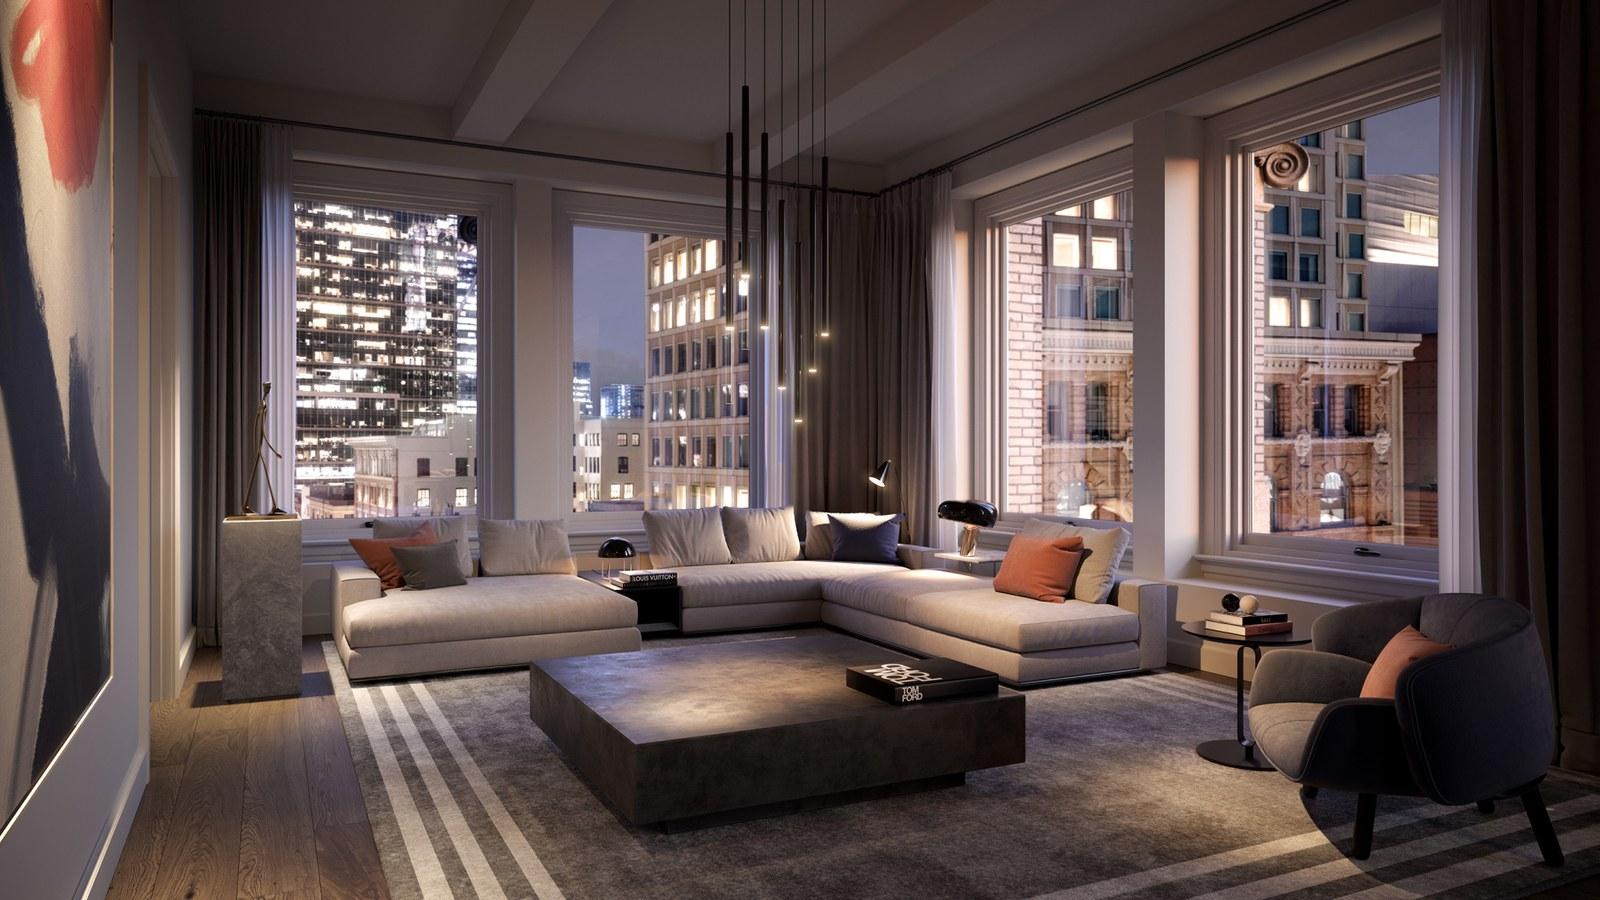 Stephen Curry Tambah Investasi Kondominium di San Fransisco